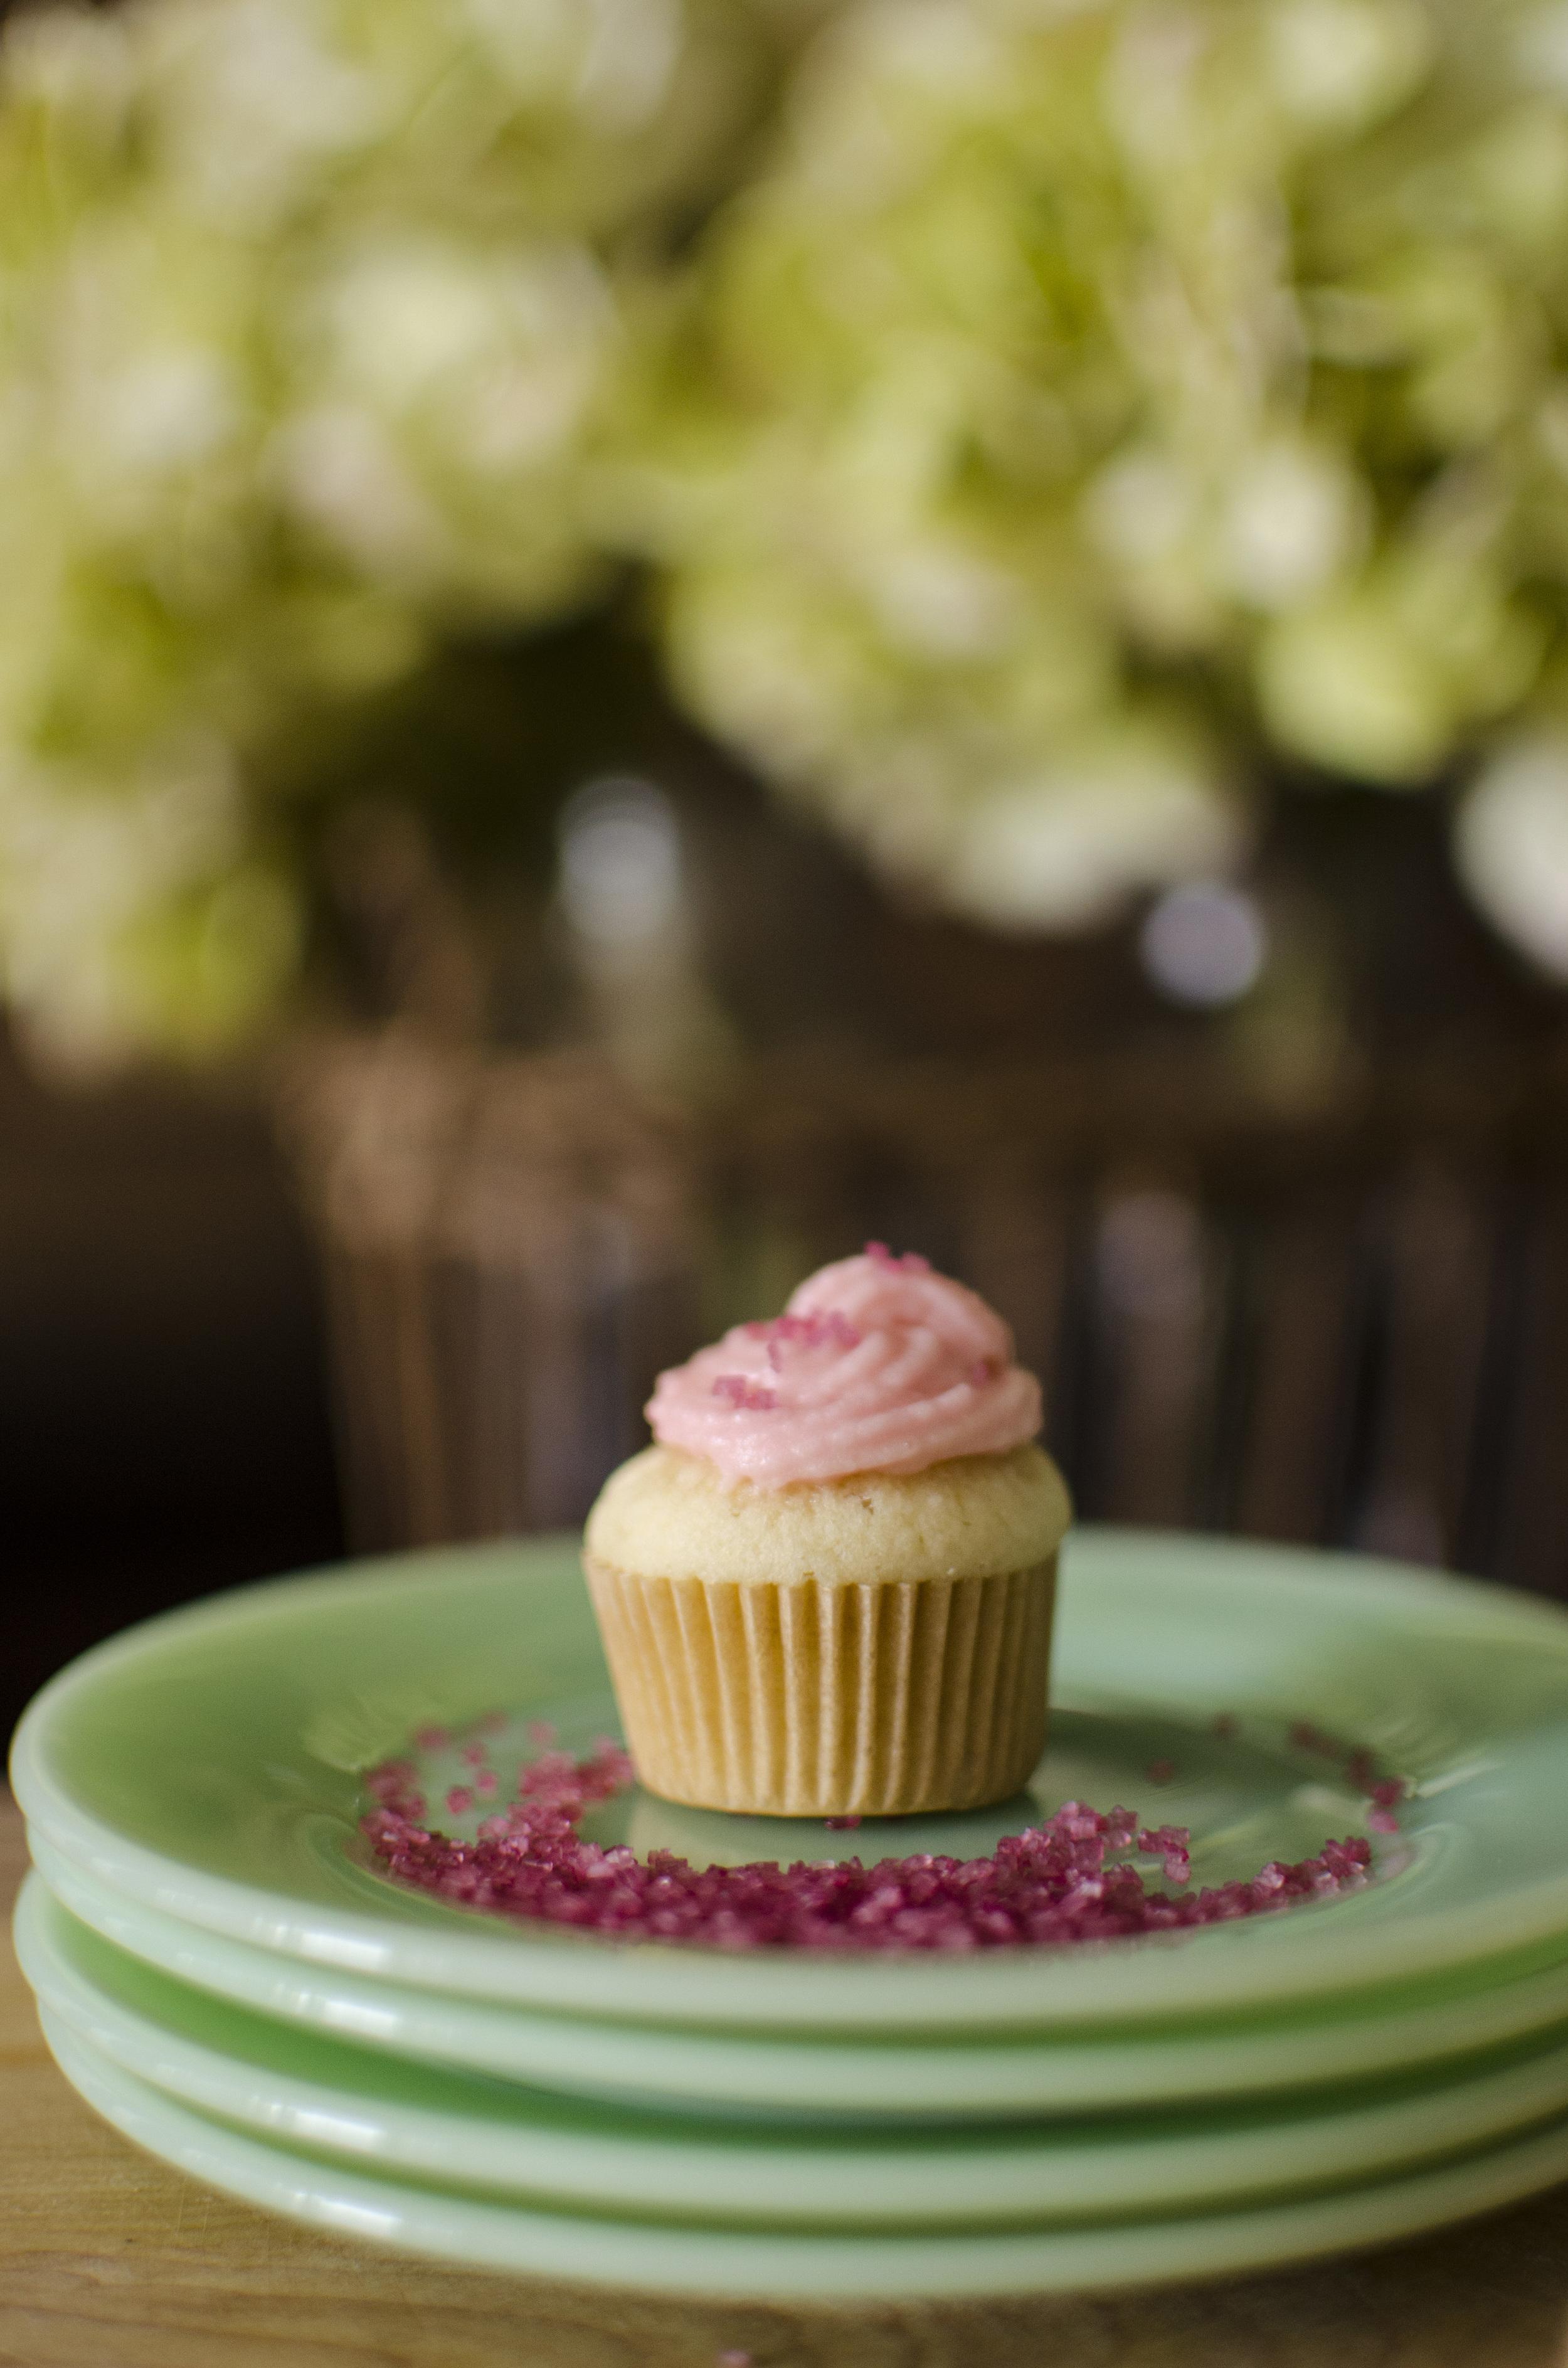 wit and aroma vanilla cupcakes